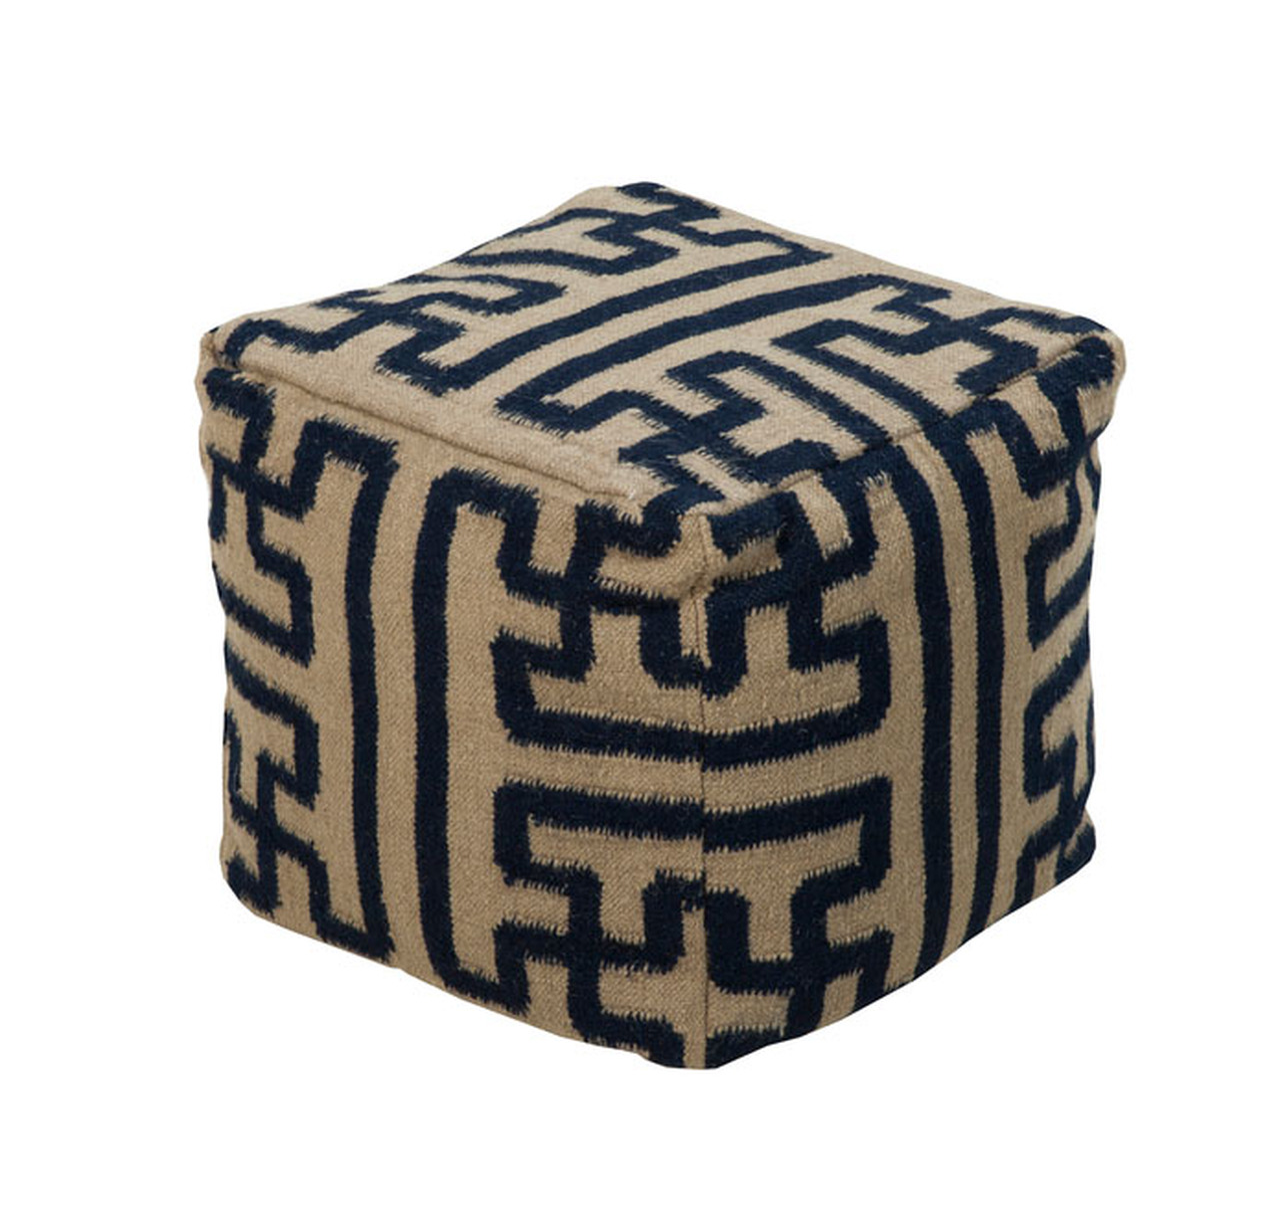 Astonishing 18 Navy Blue And Antique White Aztec Maze Wool Square Pouf Ottoman 28570524 Ibusinesslaw Wood Chair Design Ideas Ibusinesslaworg